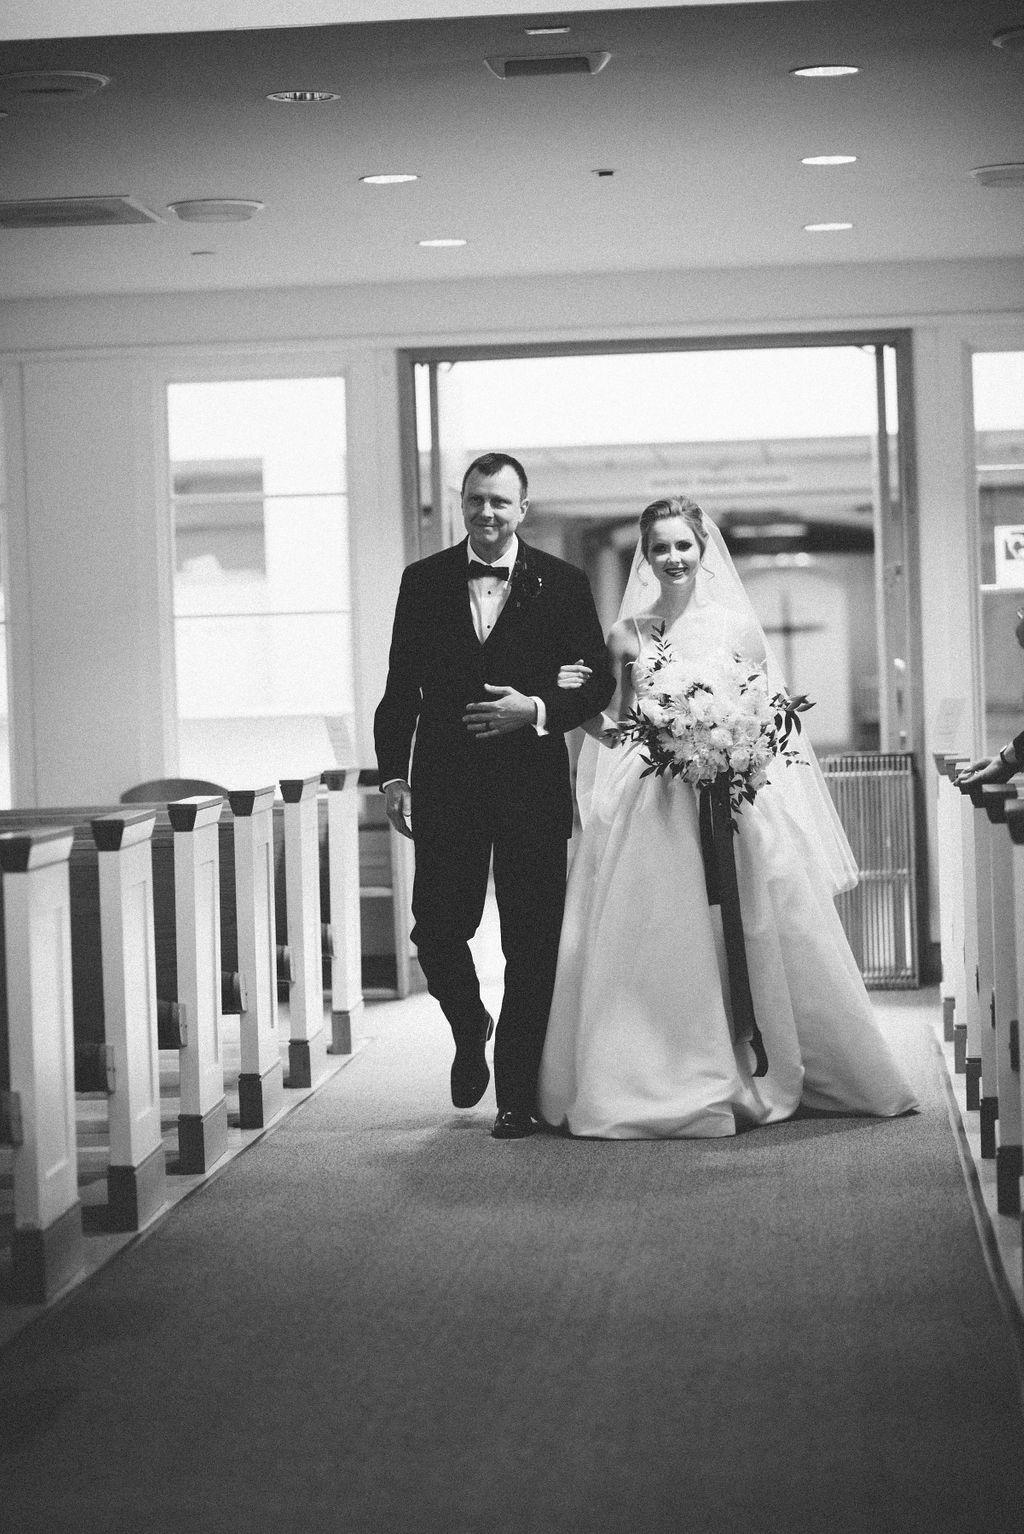 brielle-davis-events-shadow-creek-wedding-annie-david-ceremony-bride-walking-with-dad.jpg